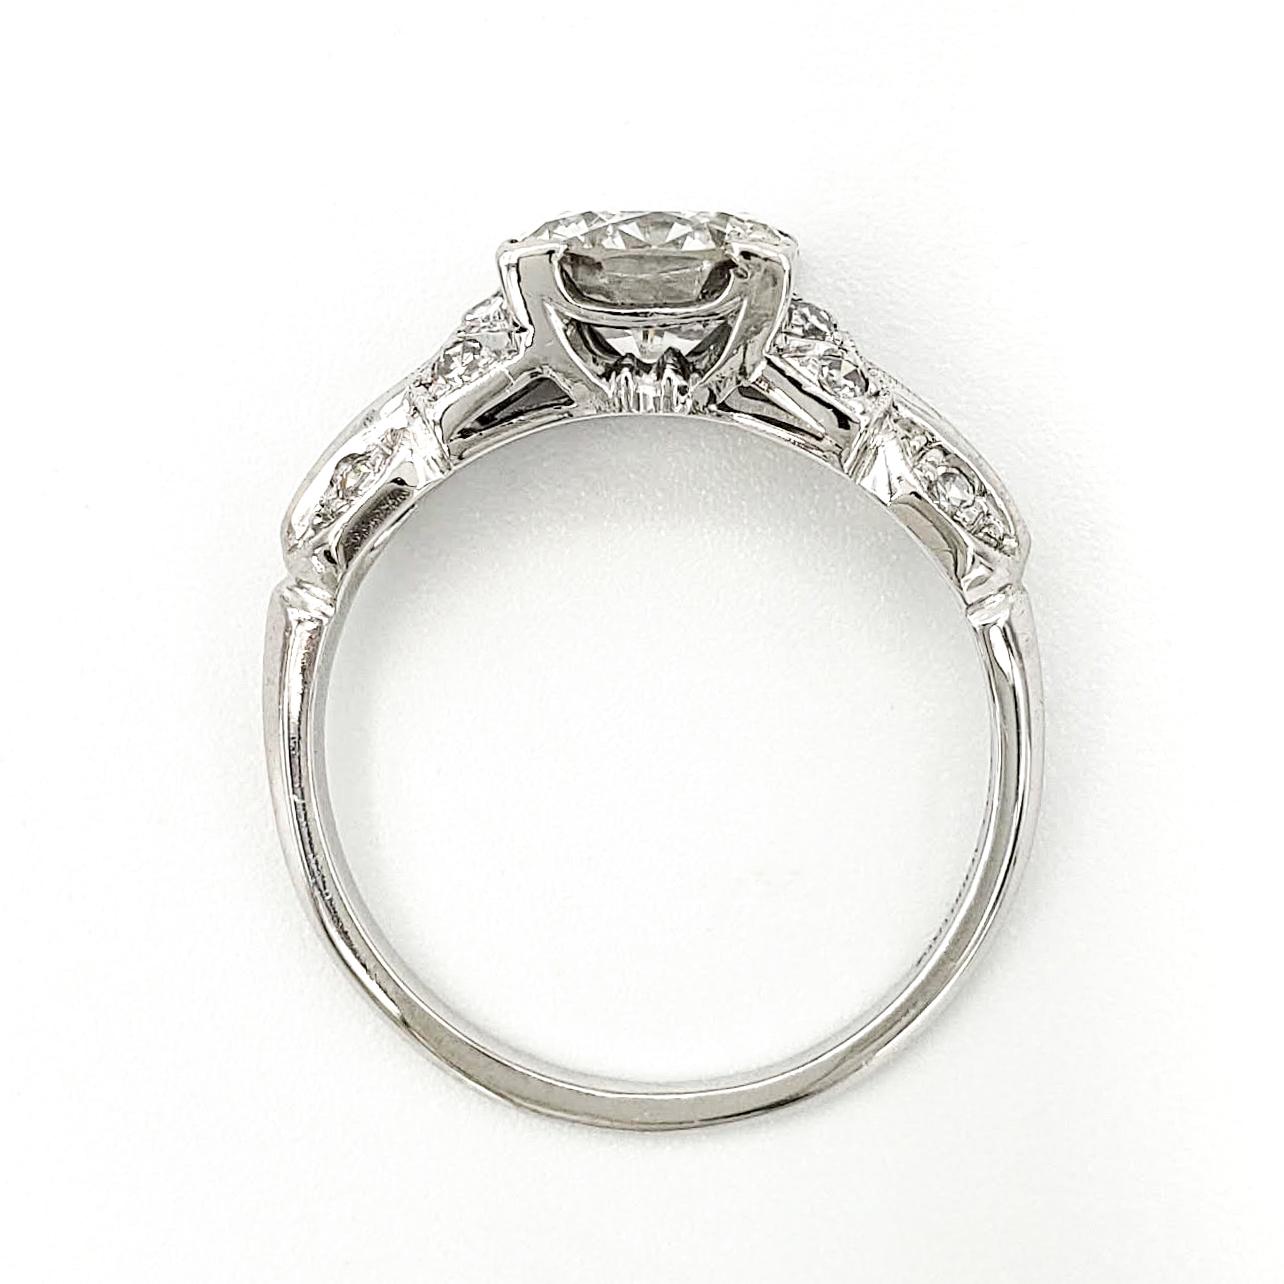 vintage-platinum-engagement-ring-with-1-33-carat-round-brilliant-cut-diamond-egl-g-si1